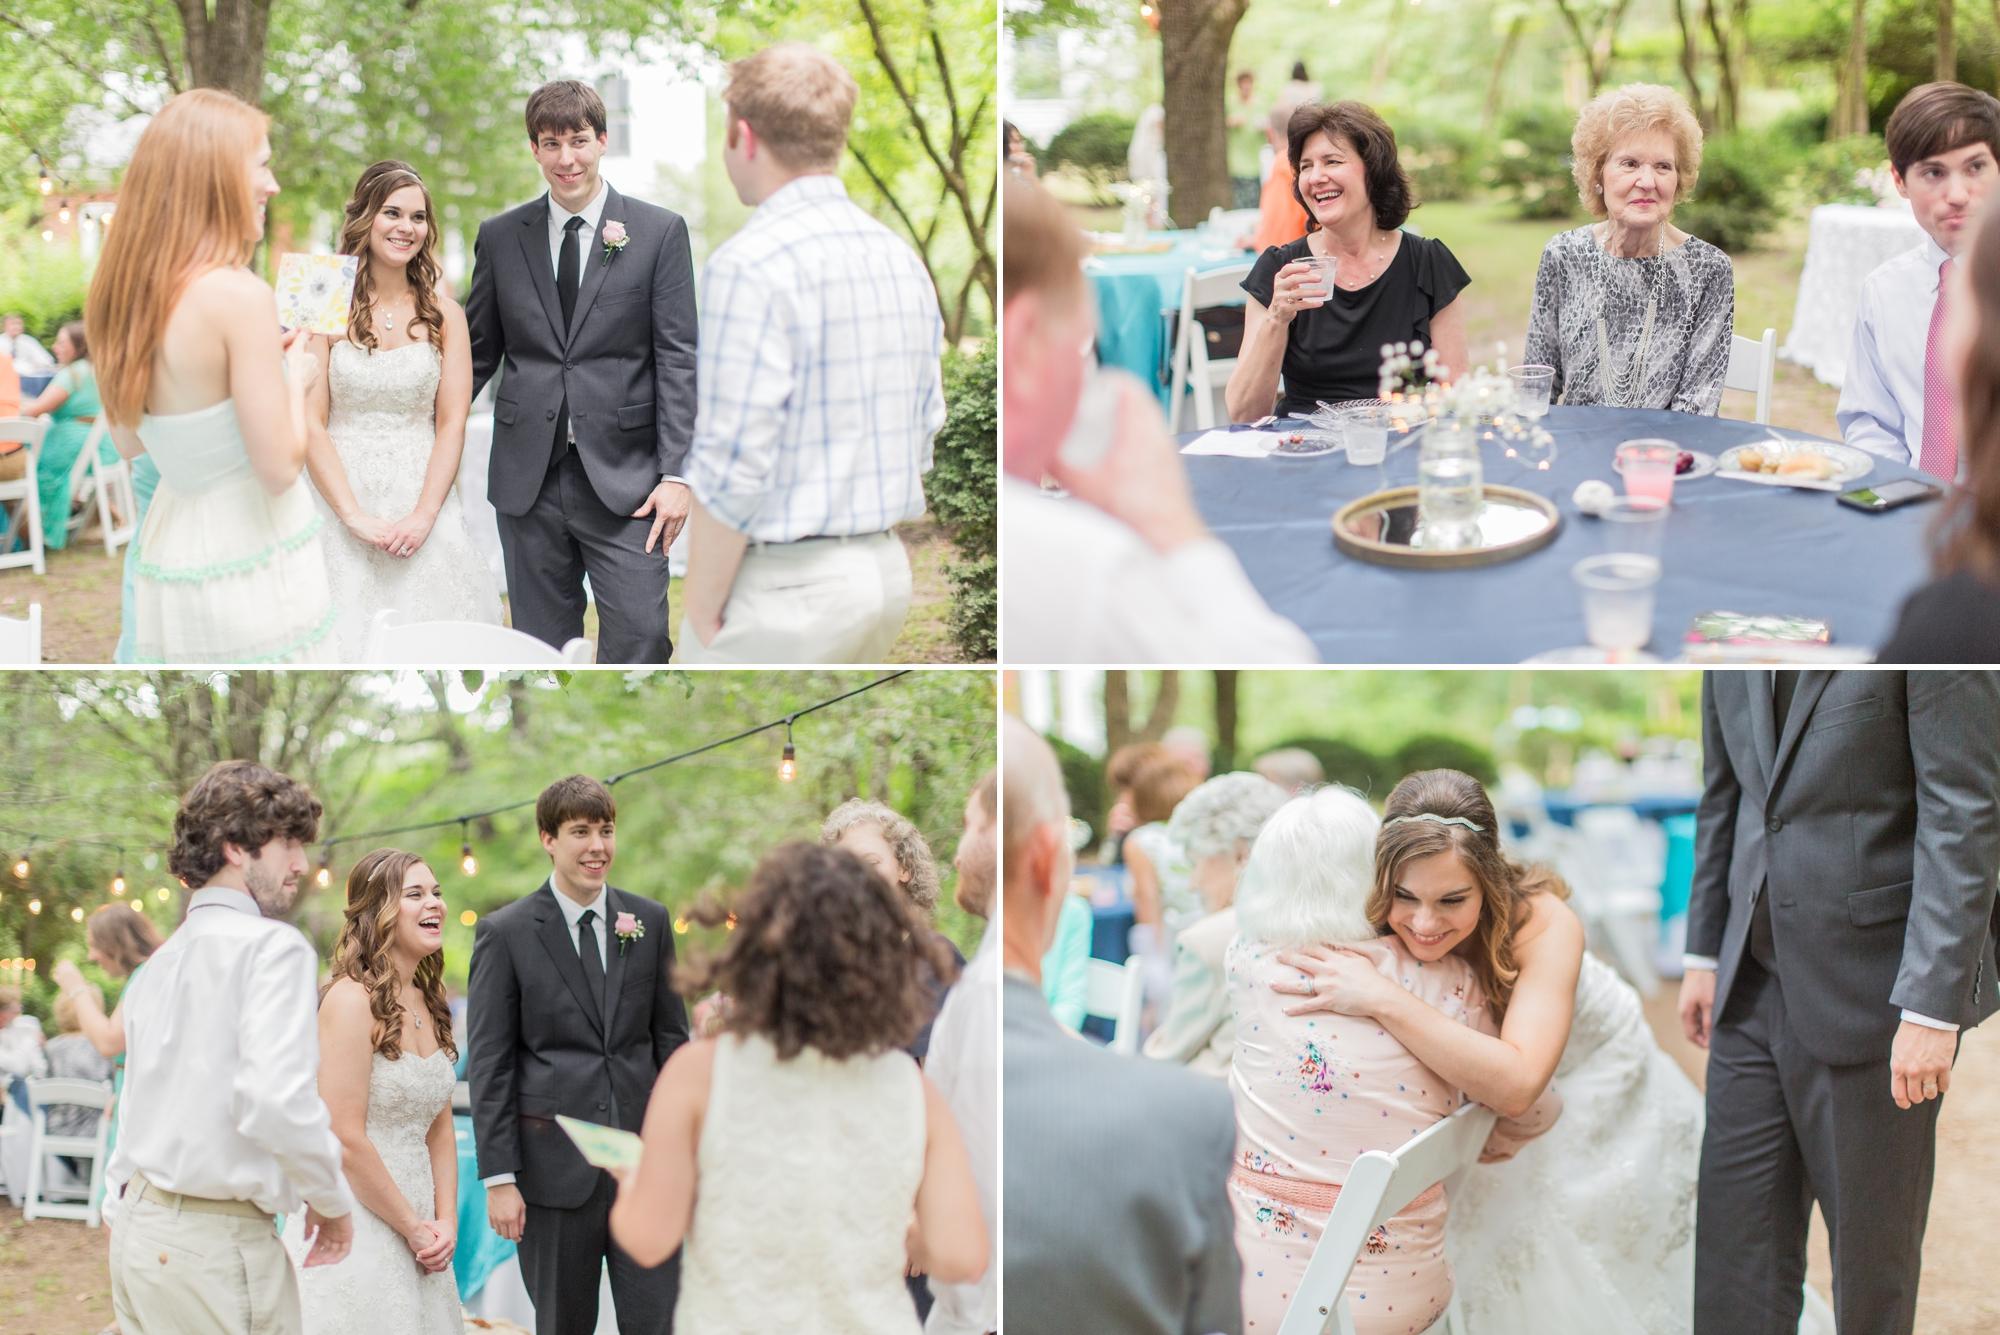 henderson wedding blog 22.jpg